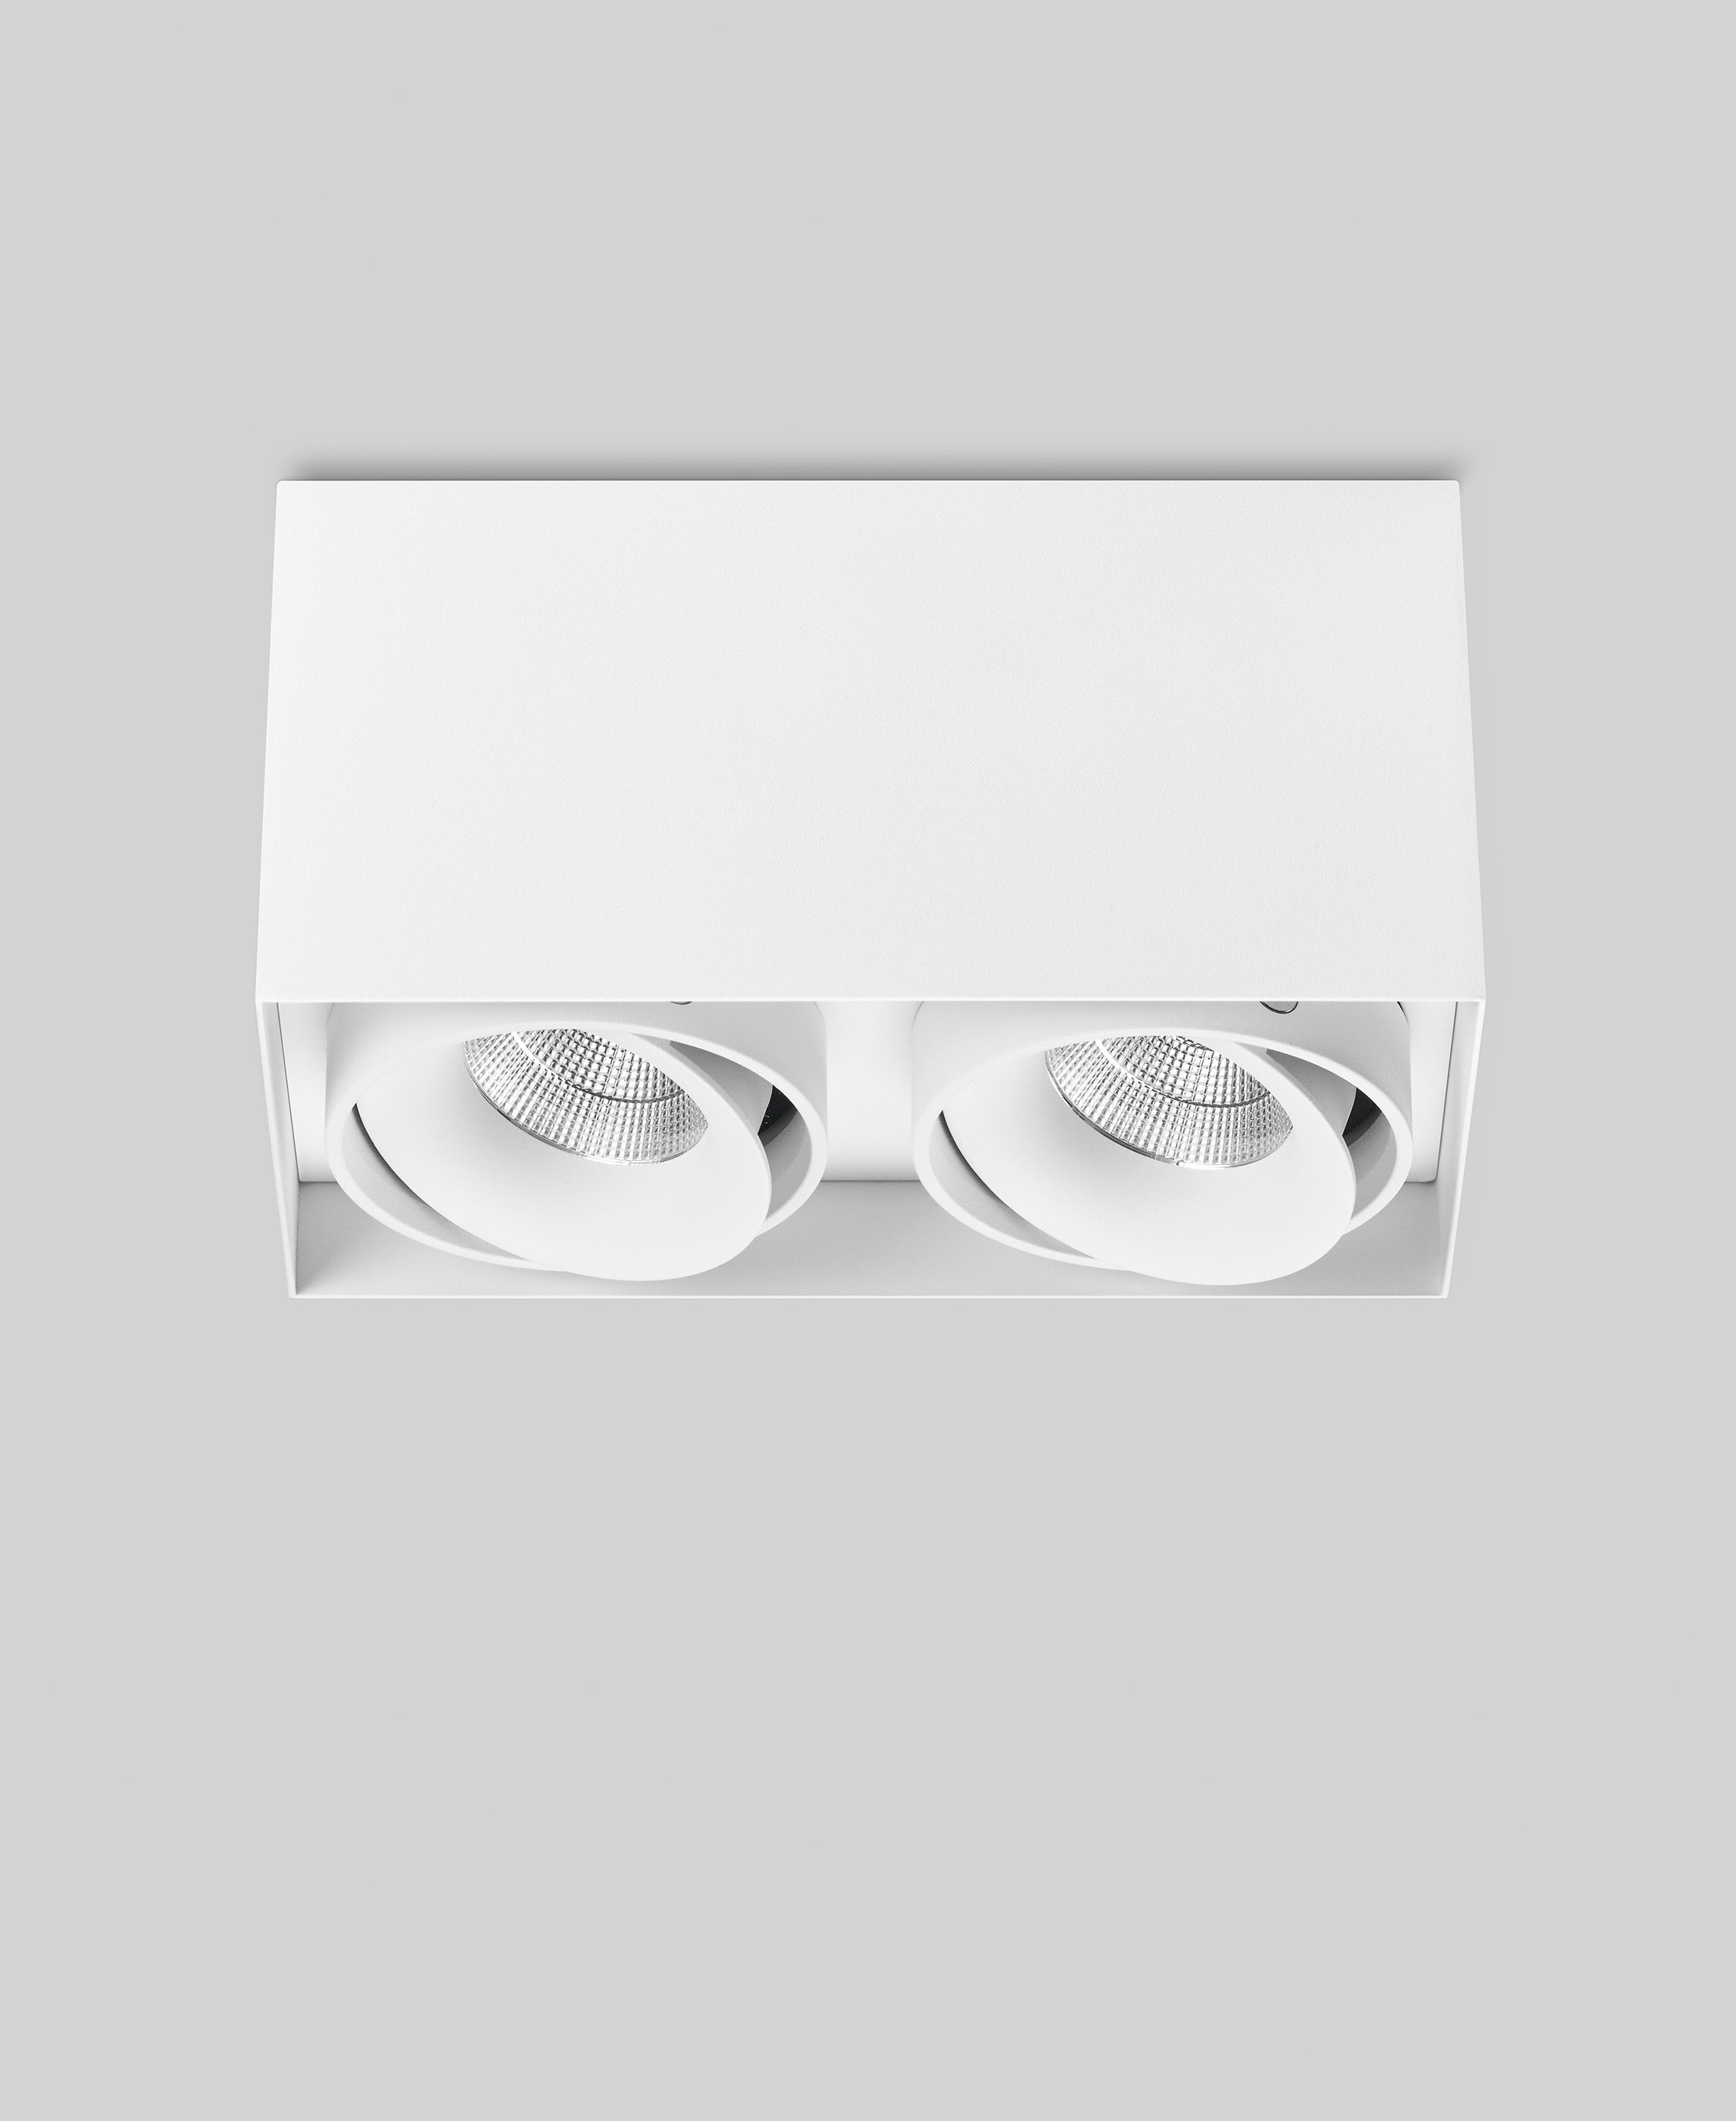 ausrichtbare led deckenstrahler e 2er wei cri 80 leuchten. Black Bedroom Furniture Sets. Home Design Ideas